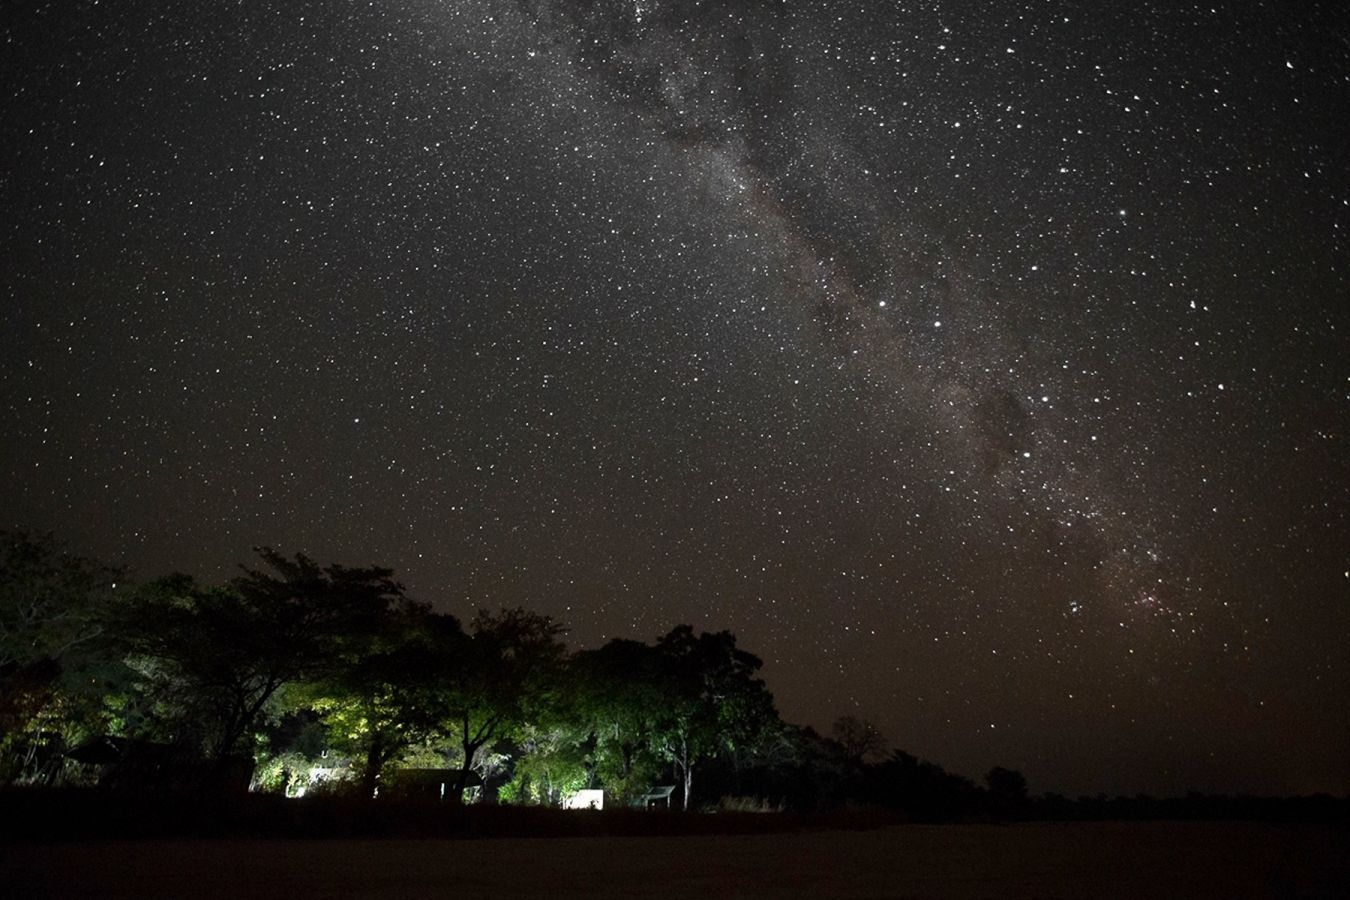 Nkonzi Camp sterrenhemel met Melkweg